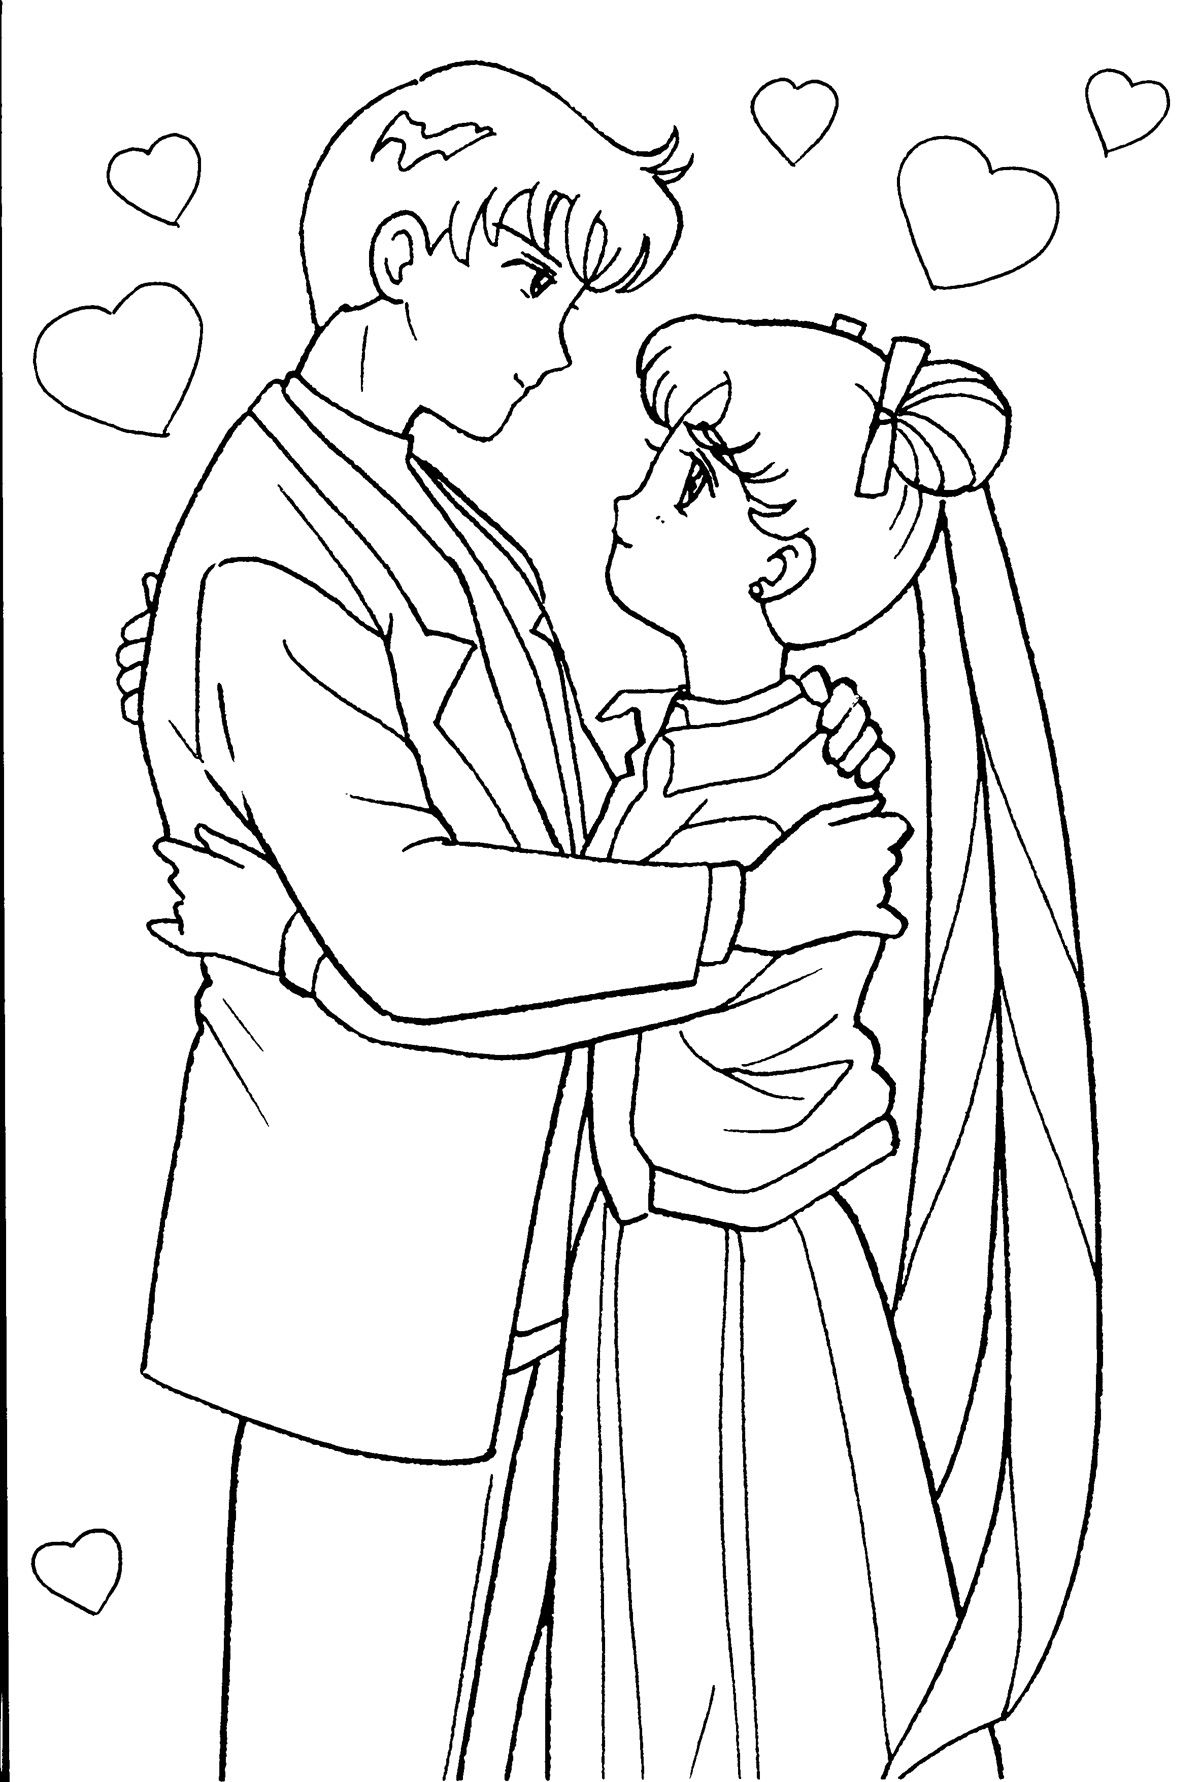 Mamoru and Usagi Coloring Page // #sailormoon | SM coluring pgs ...